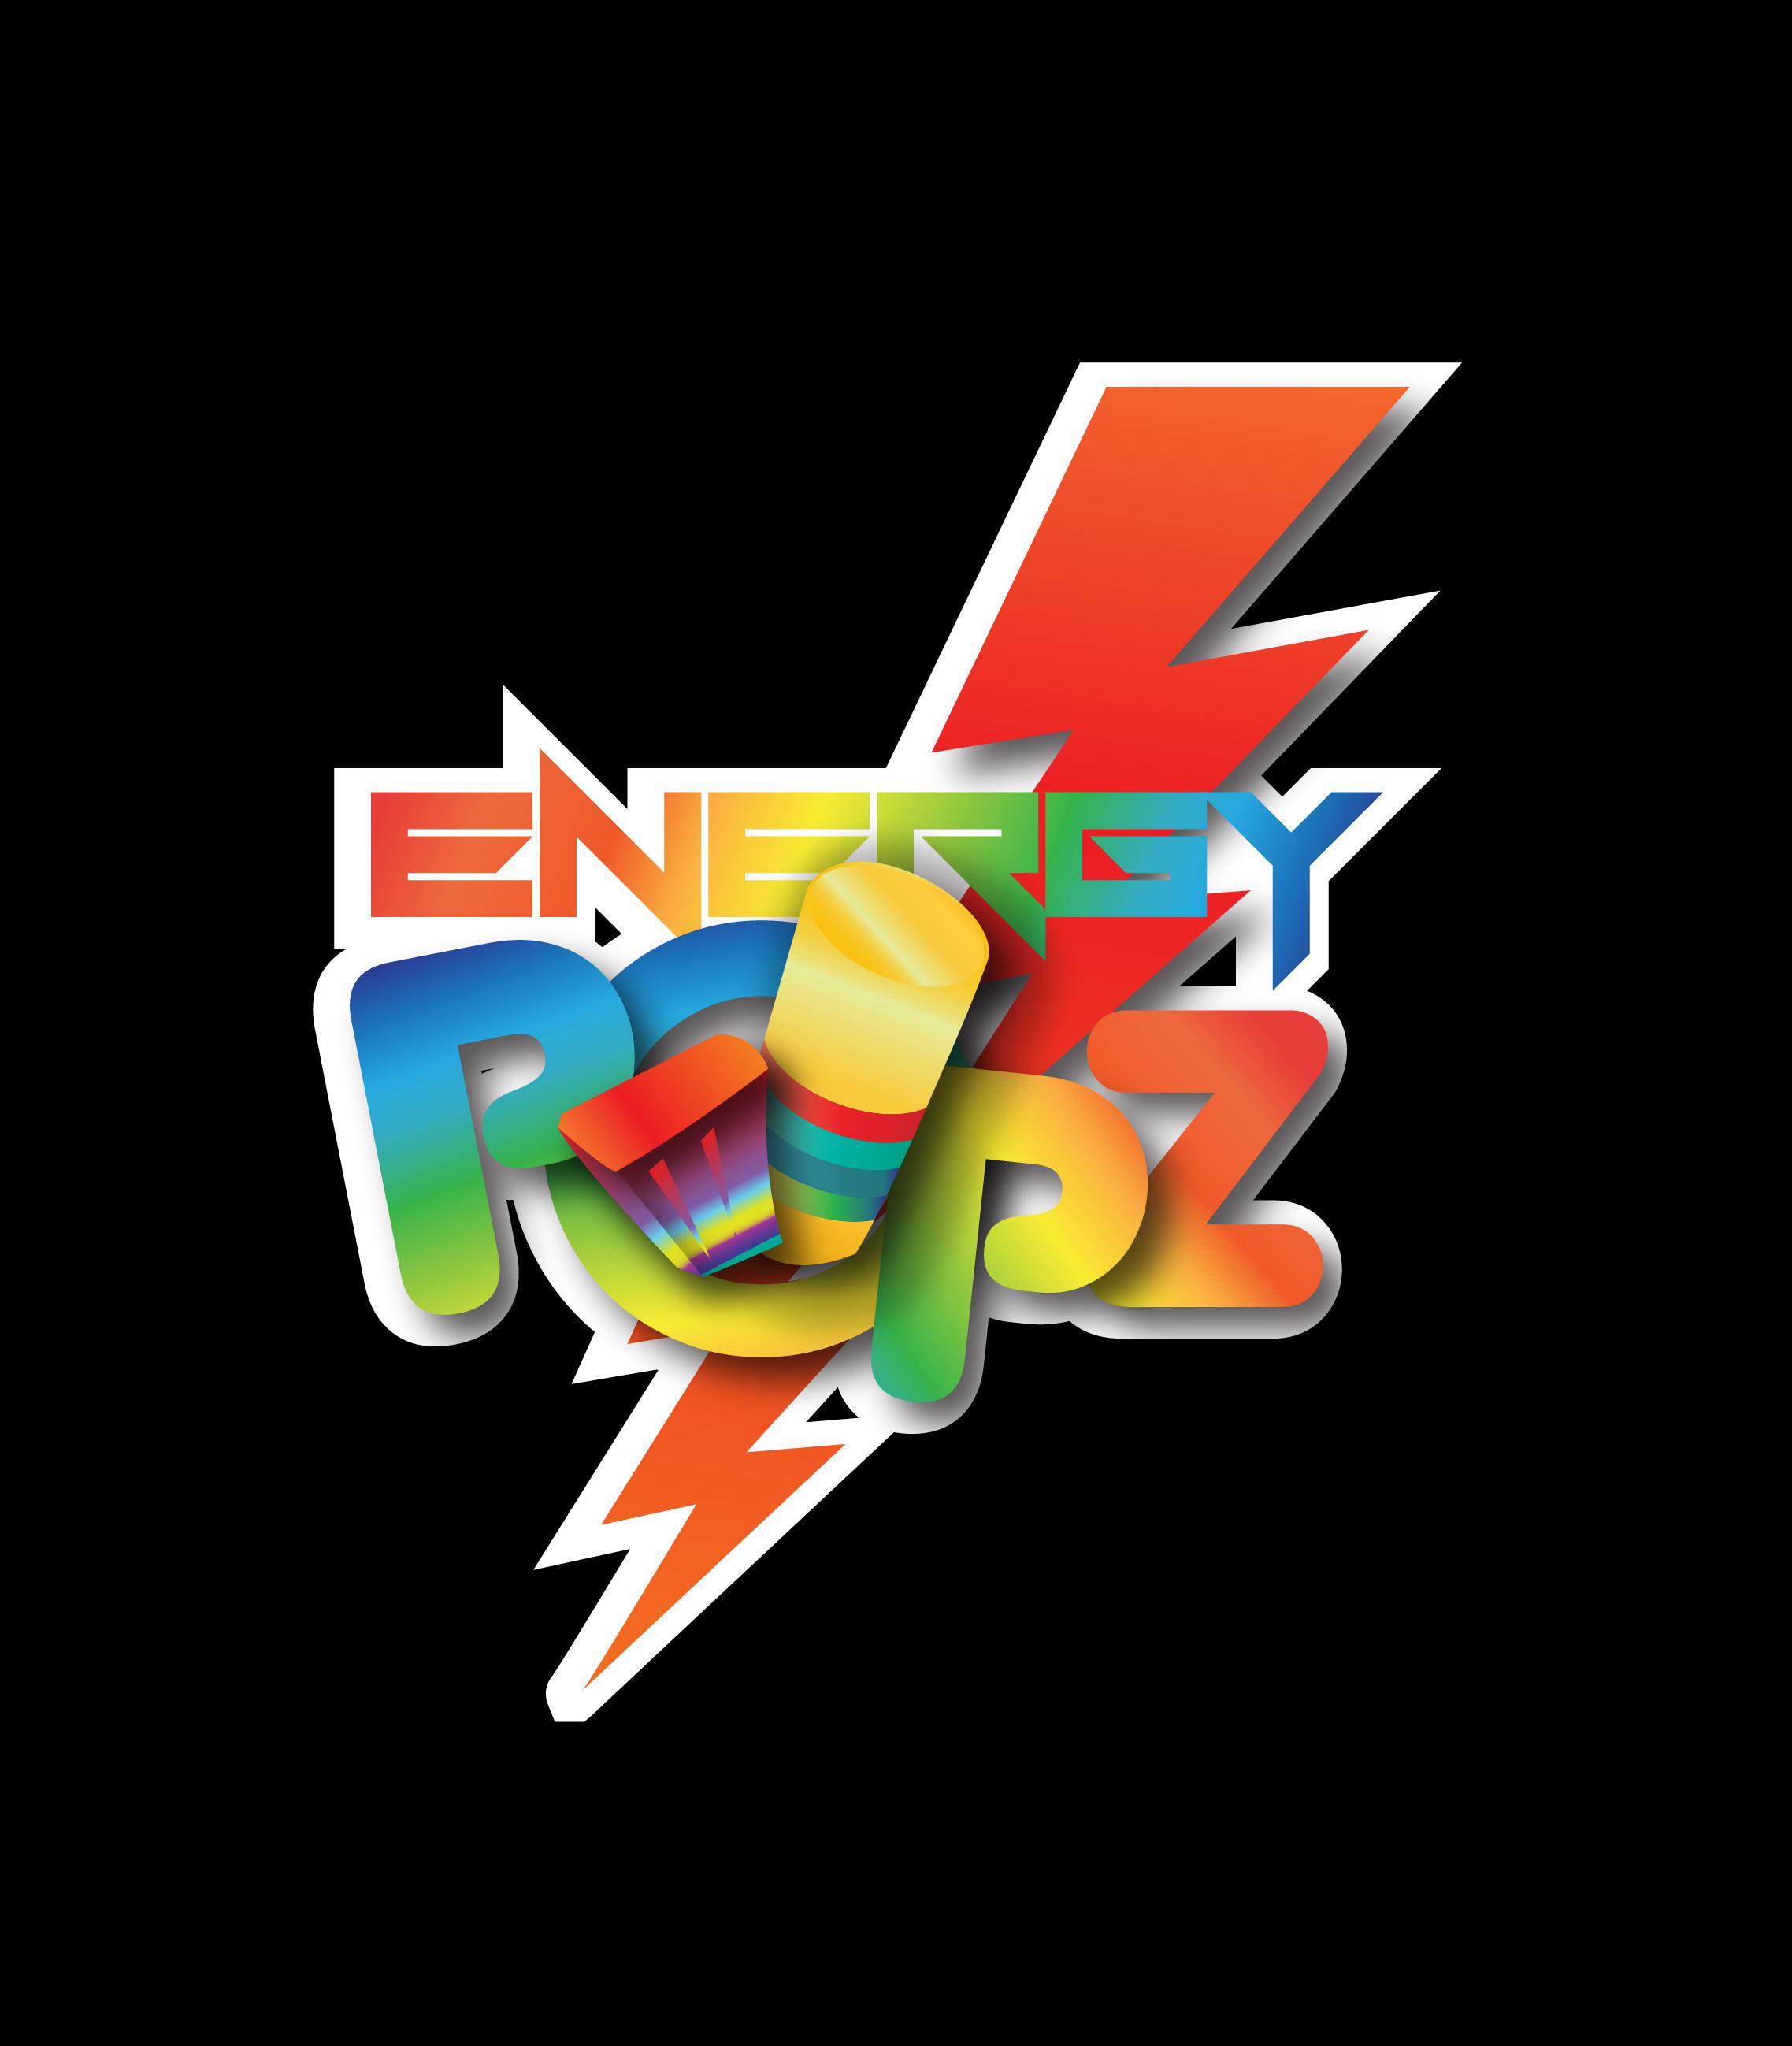 Logo Design by Sampath Gunathilaka - Entry No. 53 in the Logo Design Contest Energy Popz Logo Design.